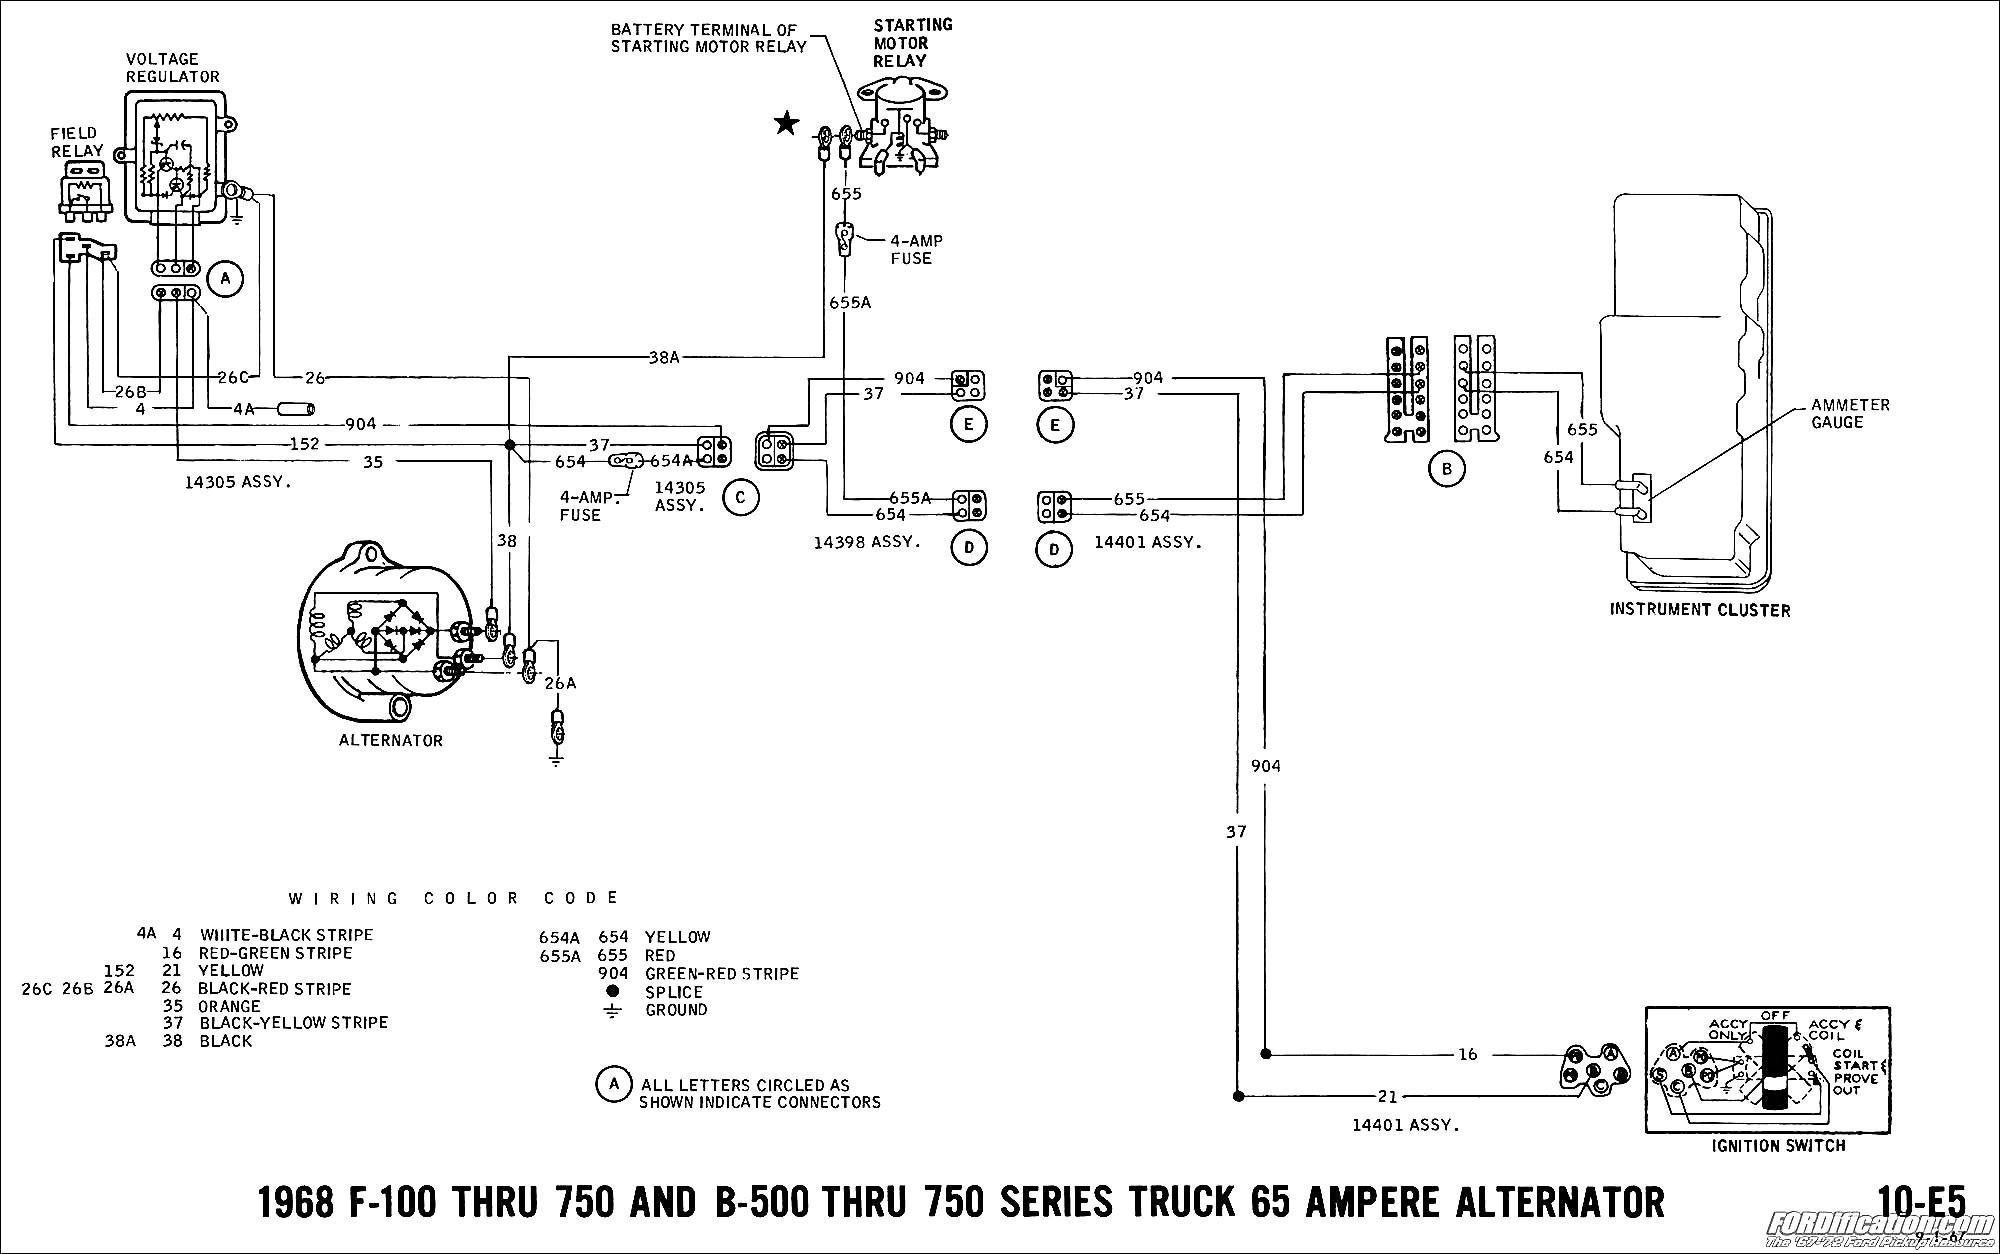 Rheostat 110 Volt Wiring Diagram Services Plug Together With Rounding Decimals Rh Plasmapen Co Outlet Ac Colors